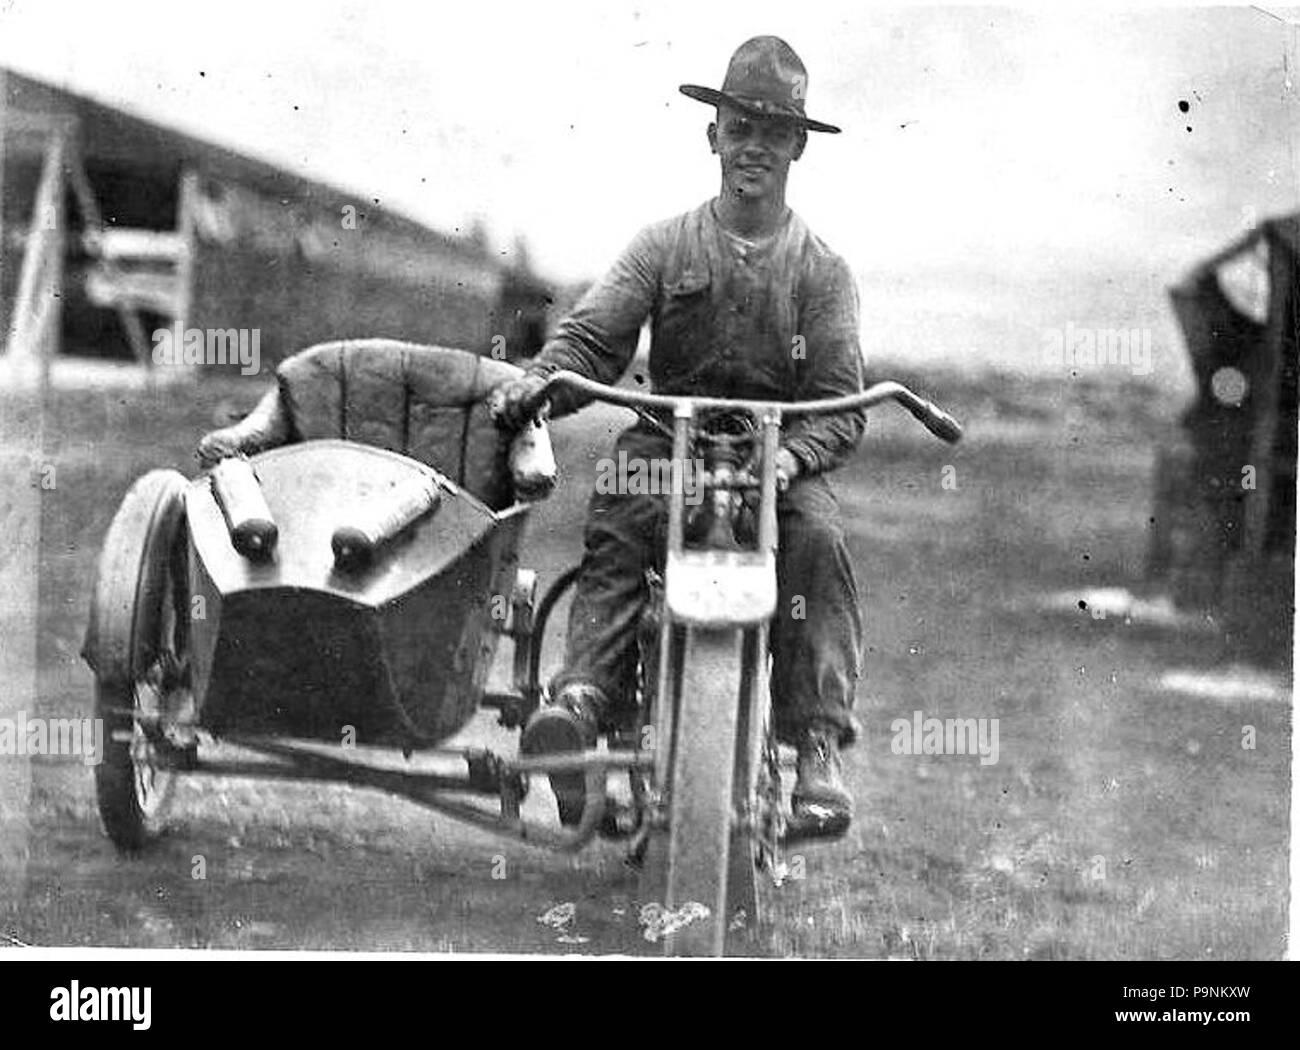 72 6th Aero Squadron motorcycle - Stock Image